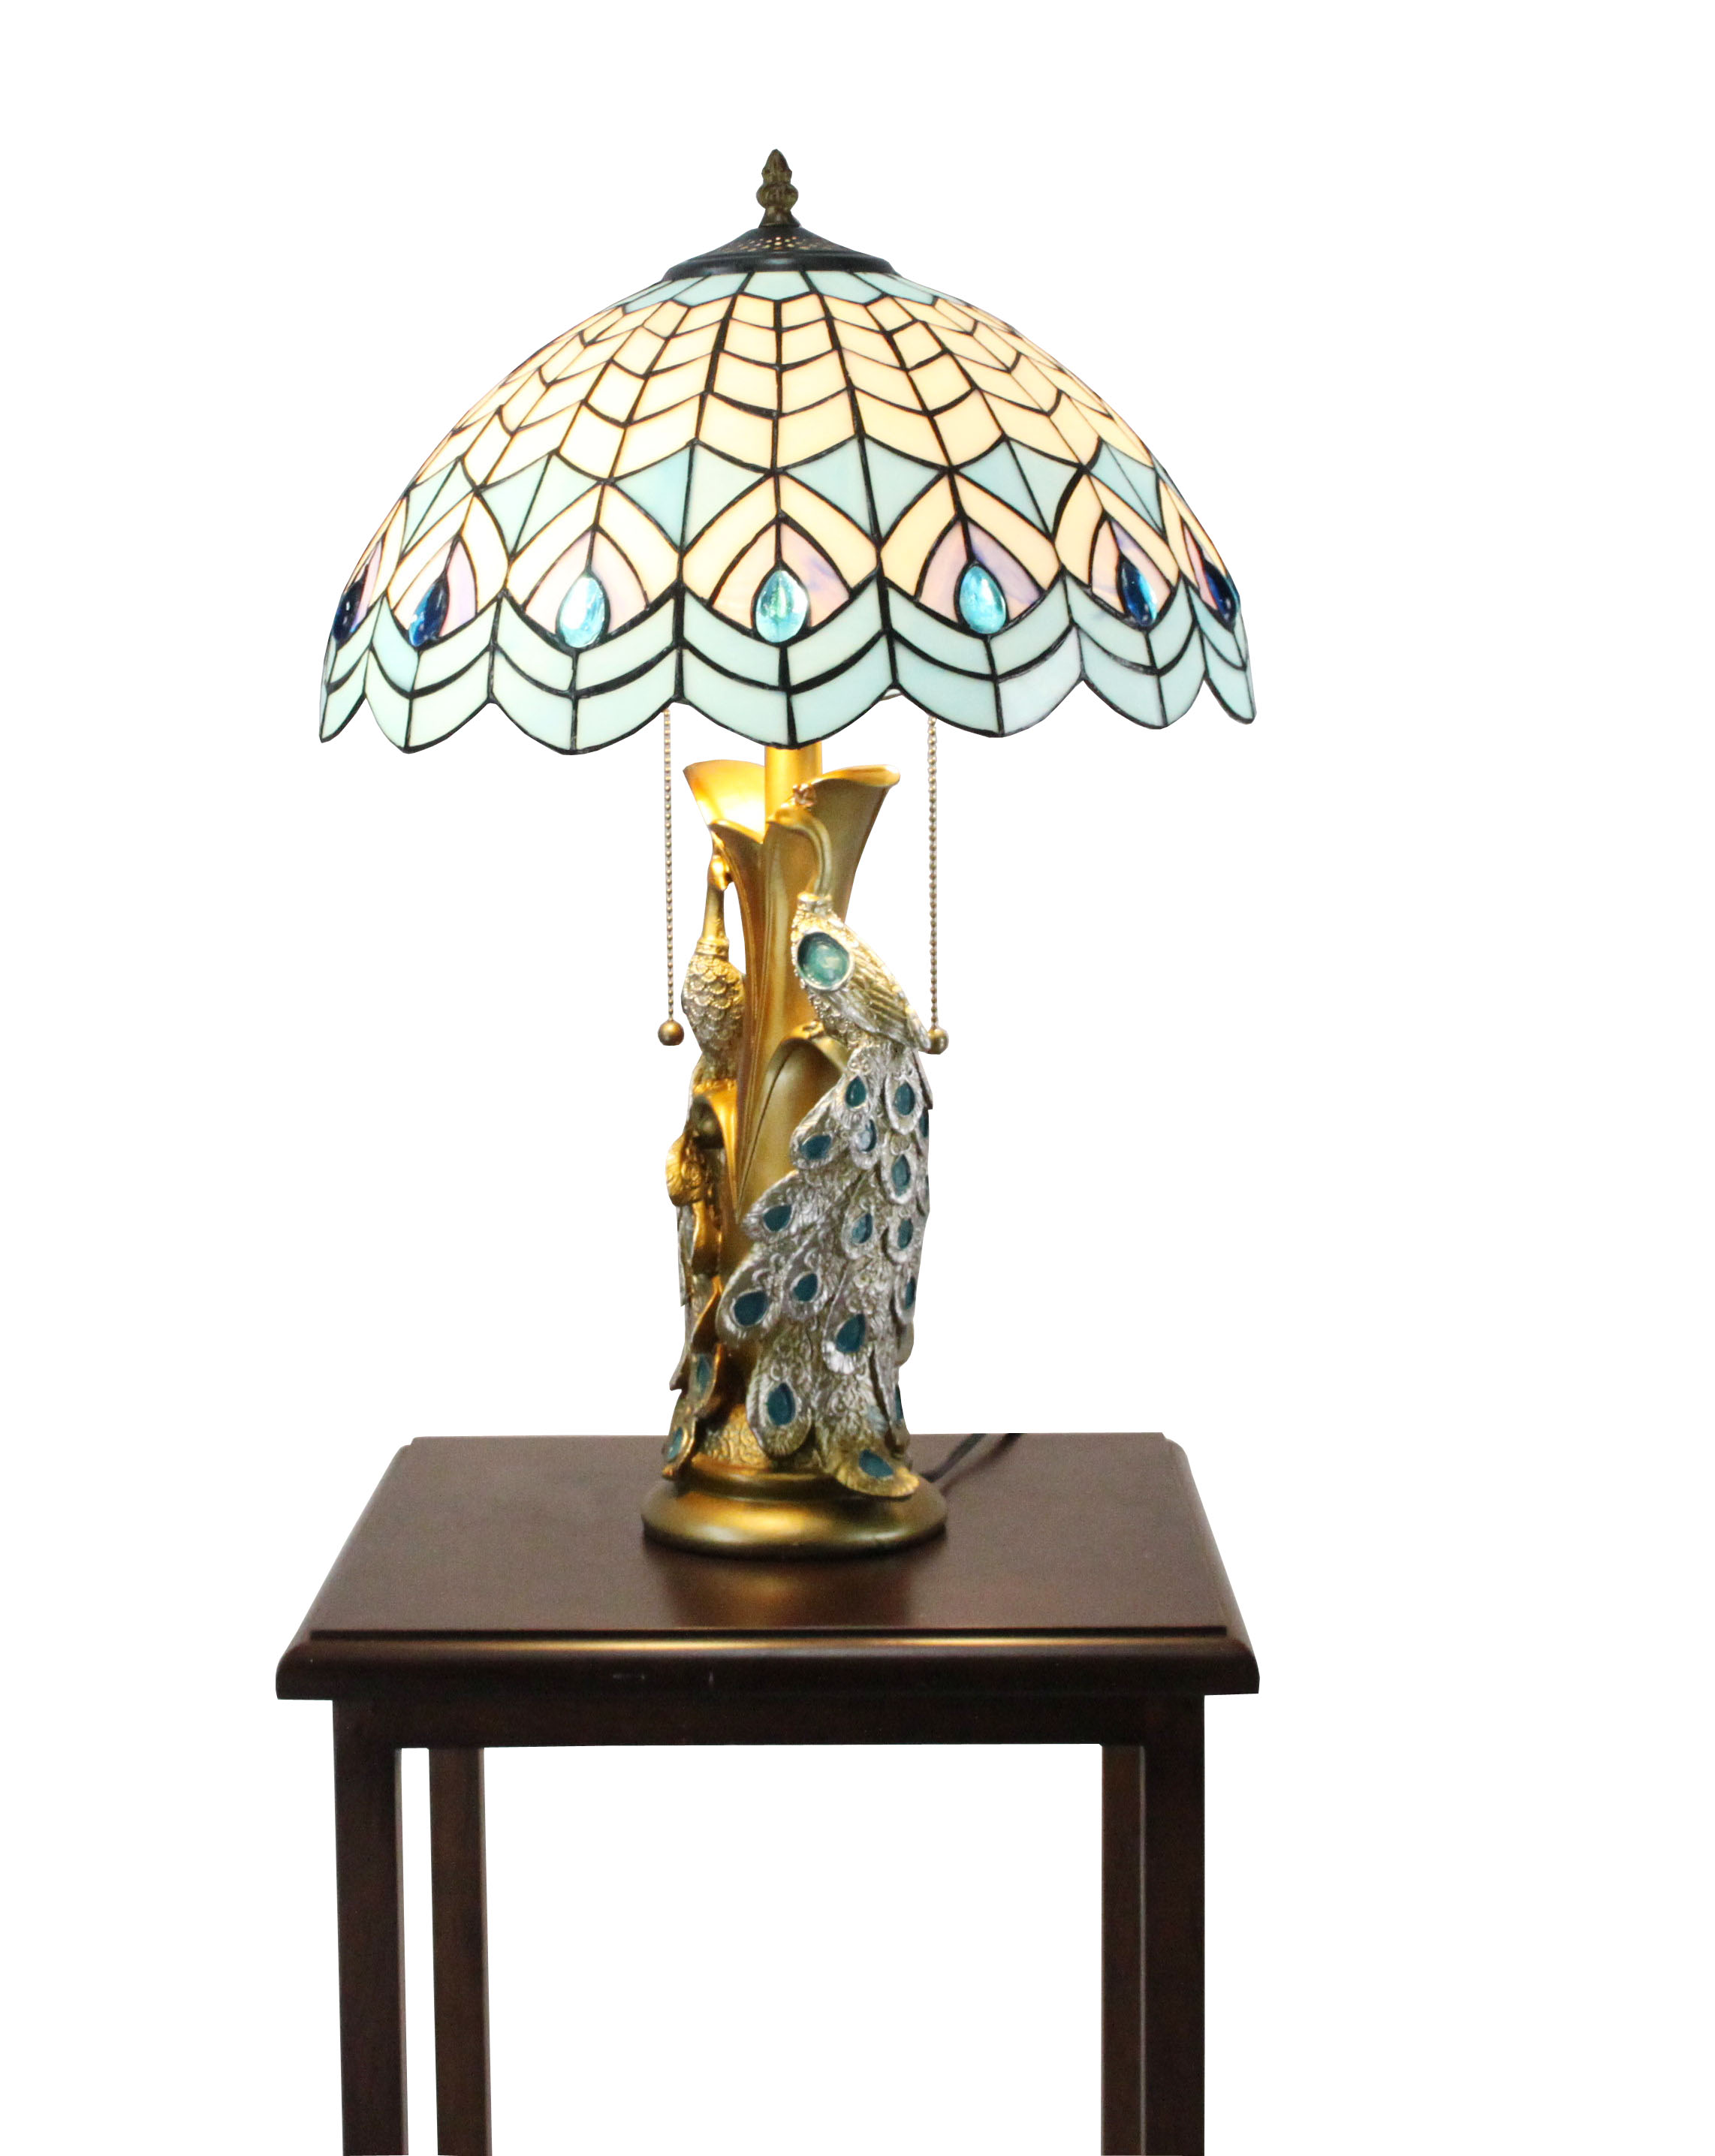 tiffany night stand lamp tiffany tabletop light fixture. Black Bedroom Furniture Sets. Home Design Ideas